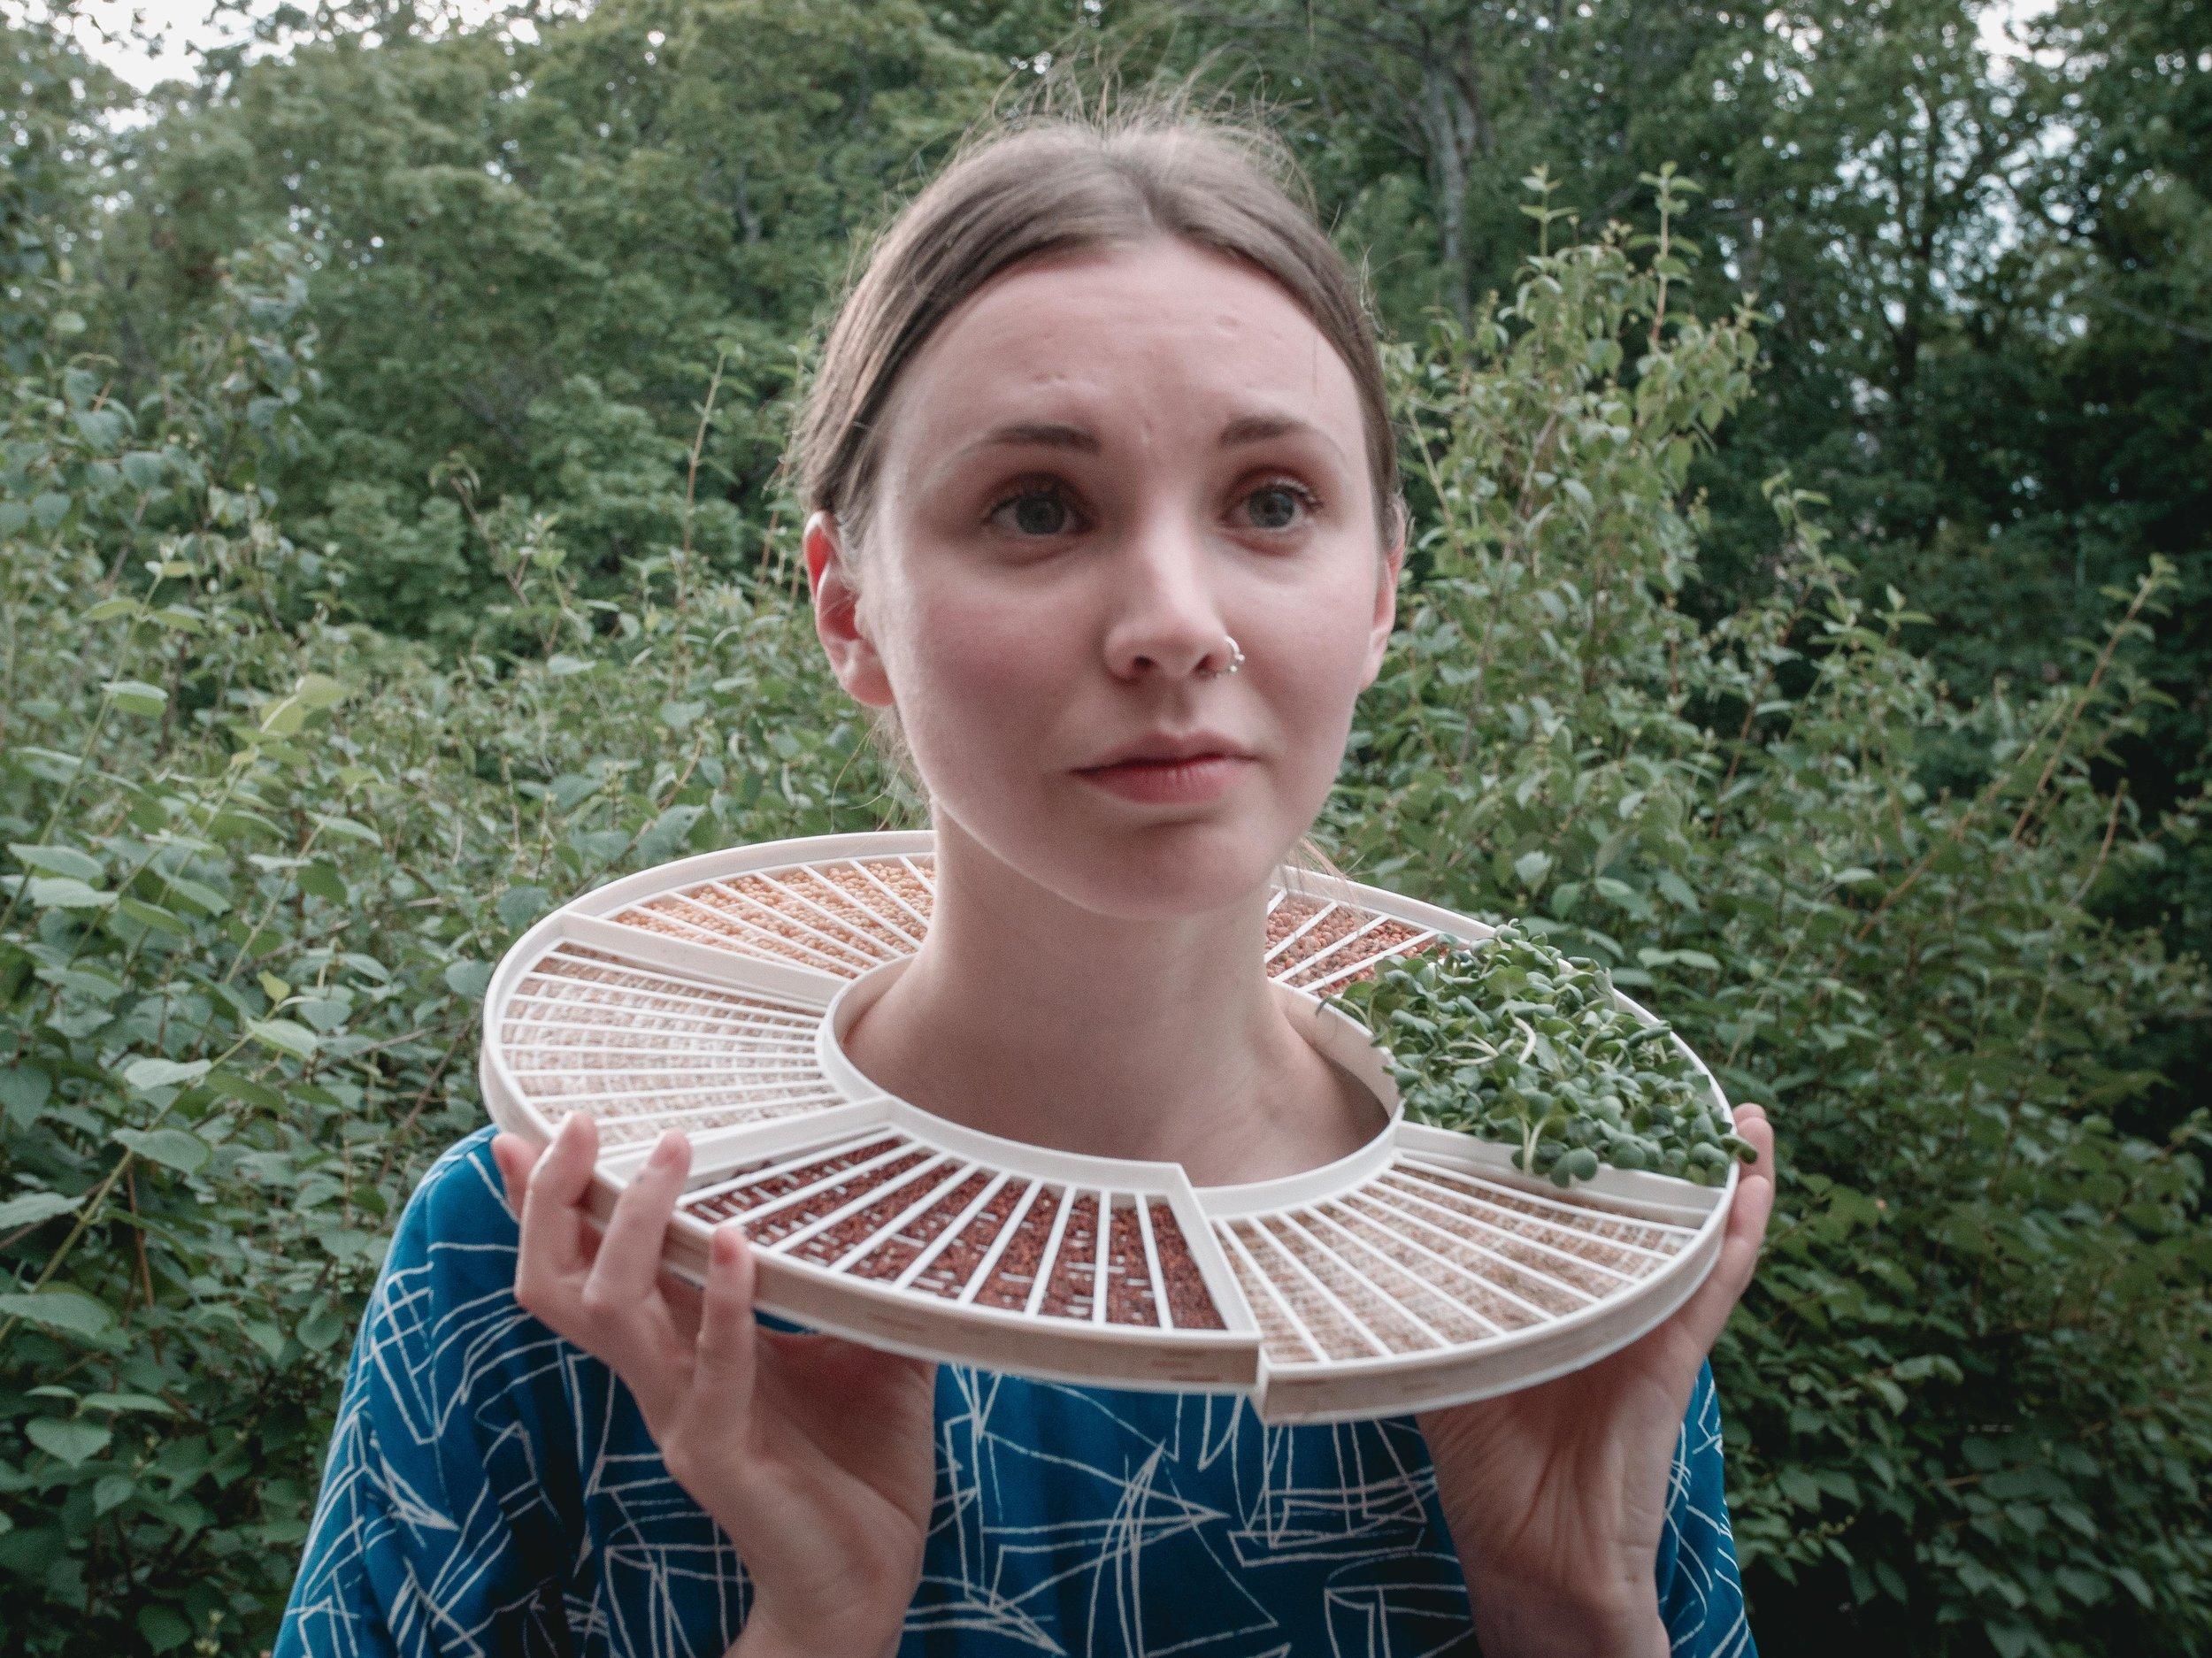 micro greens growing collar by Liisa   photo by Ivars Burtnieks